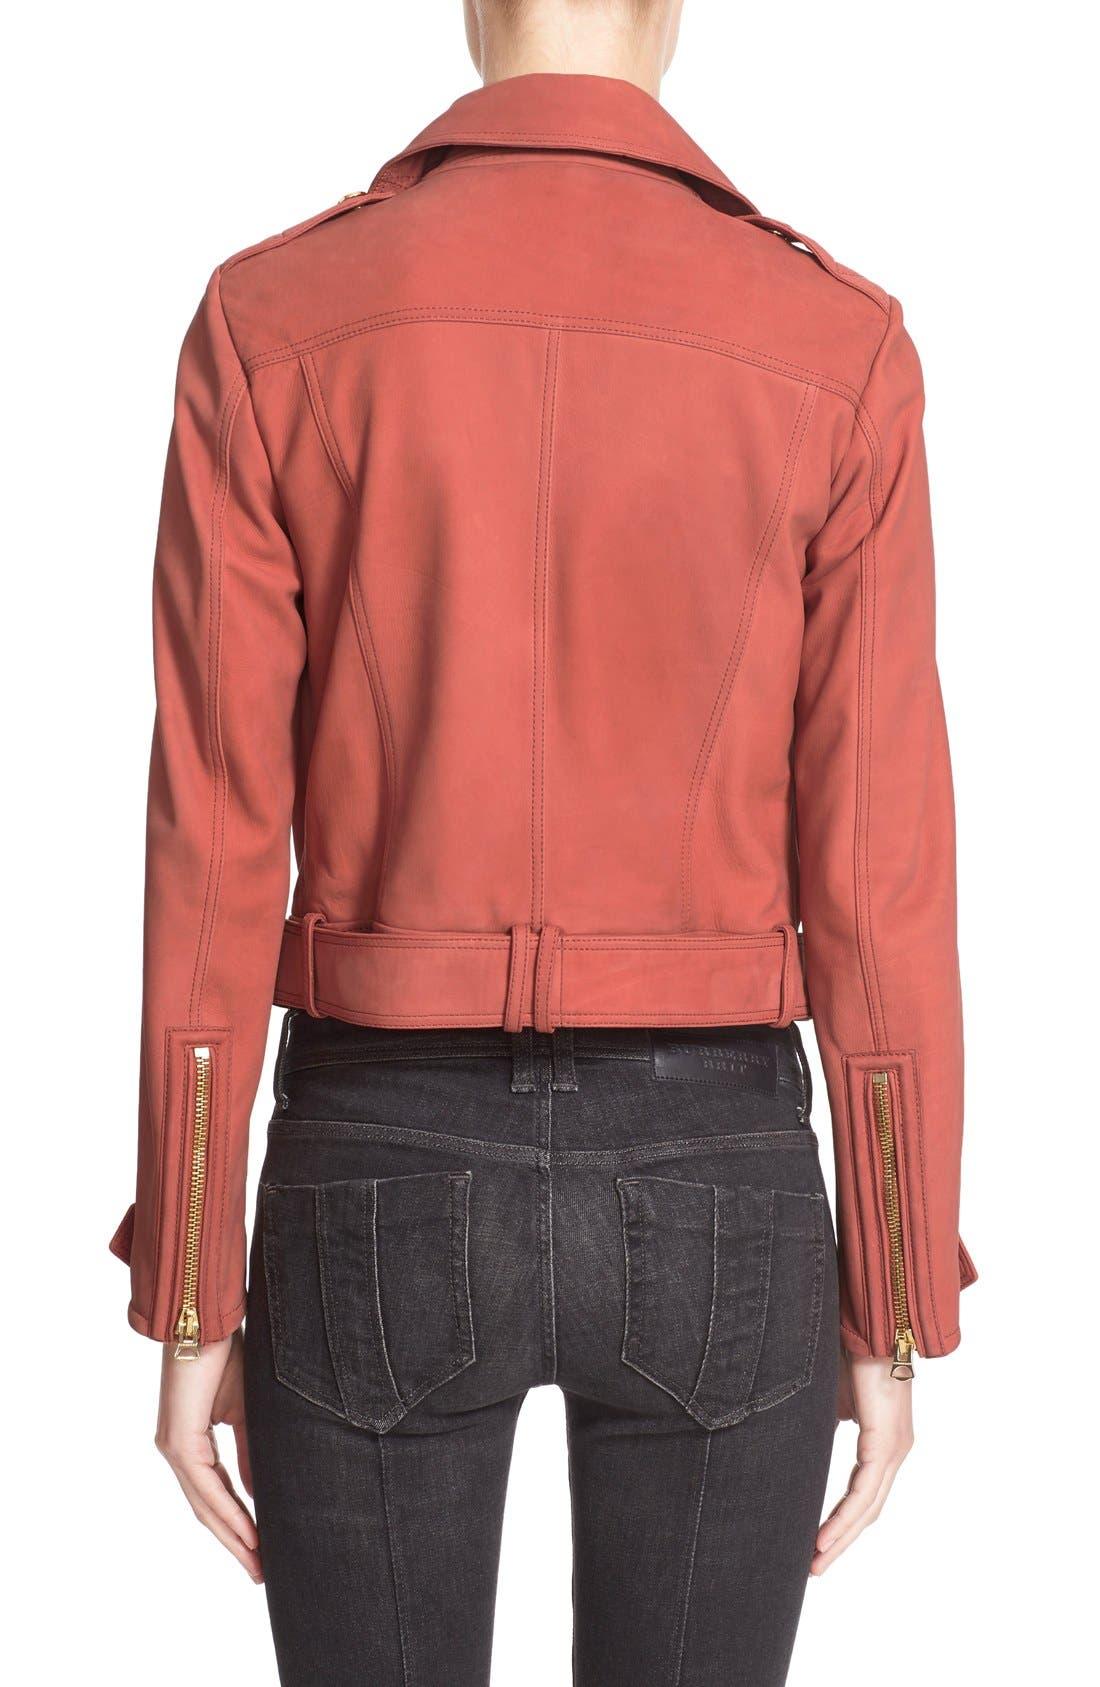 Alternate Image 2  - Burberry Brit 'Pattersby' Suede Moto Jacket